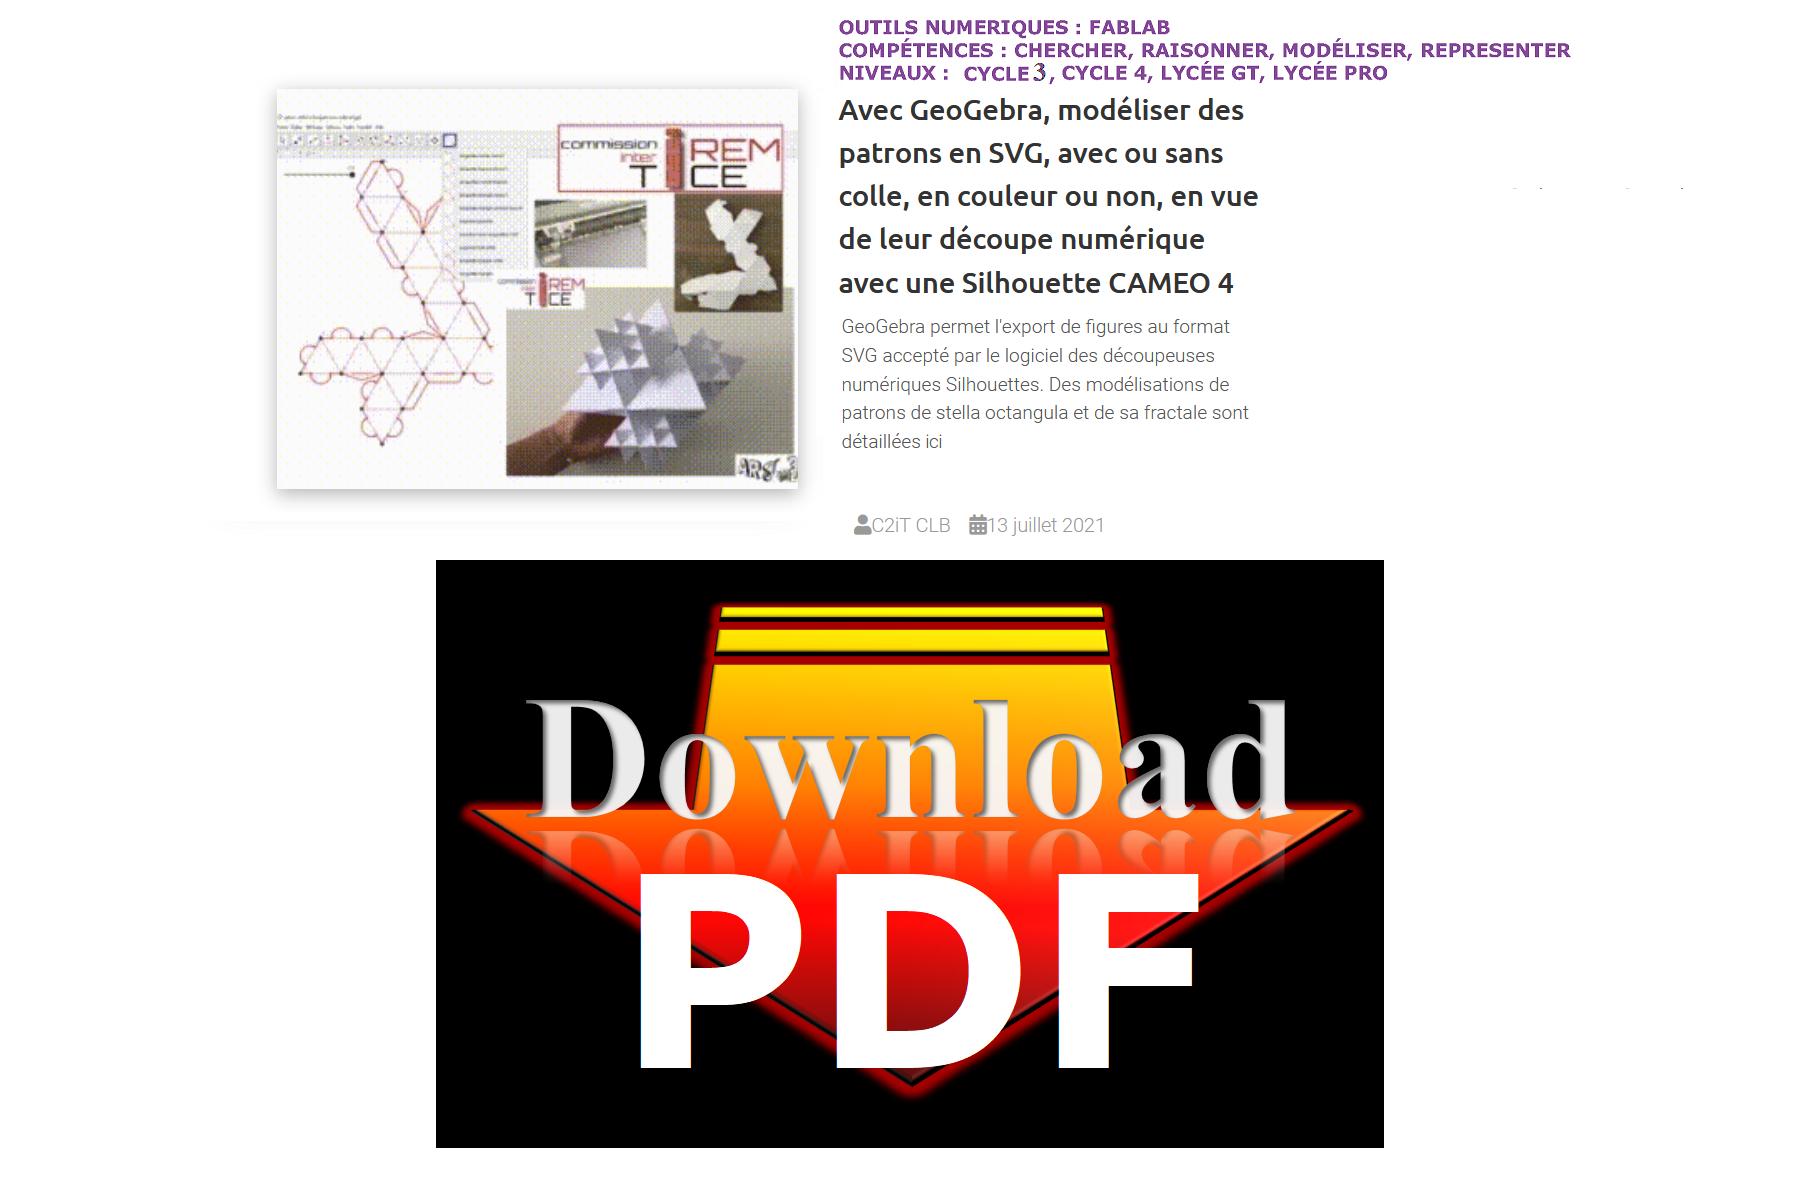 entete-modele3d-geogebra-decoupeuse-1800x1200-download-pdf-v2